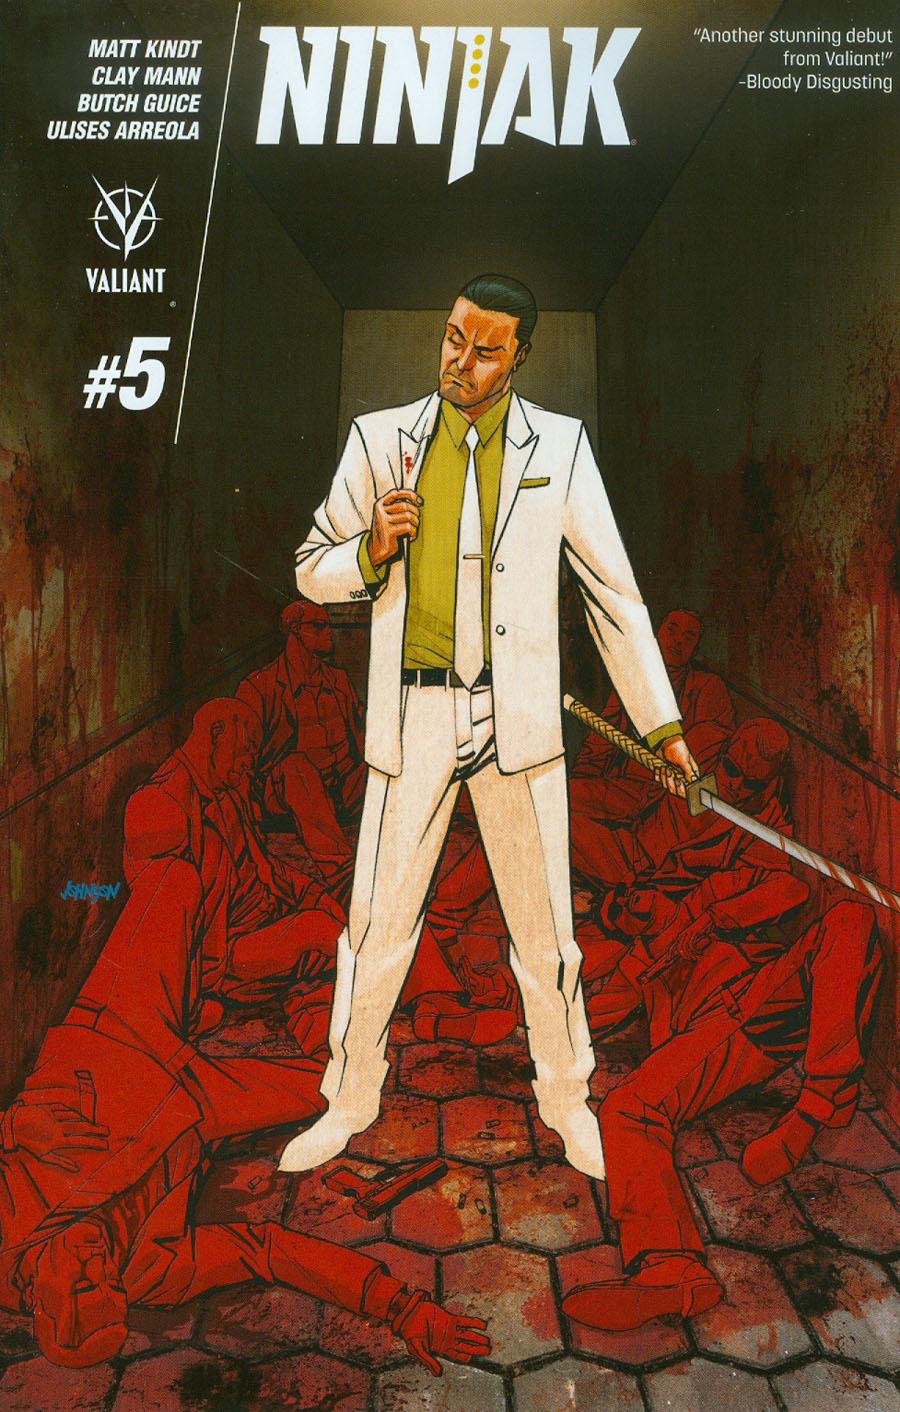 Ninjak Vol 3 #5 Cover B Variant Dave Johnson Cover